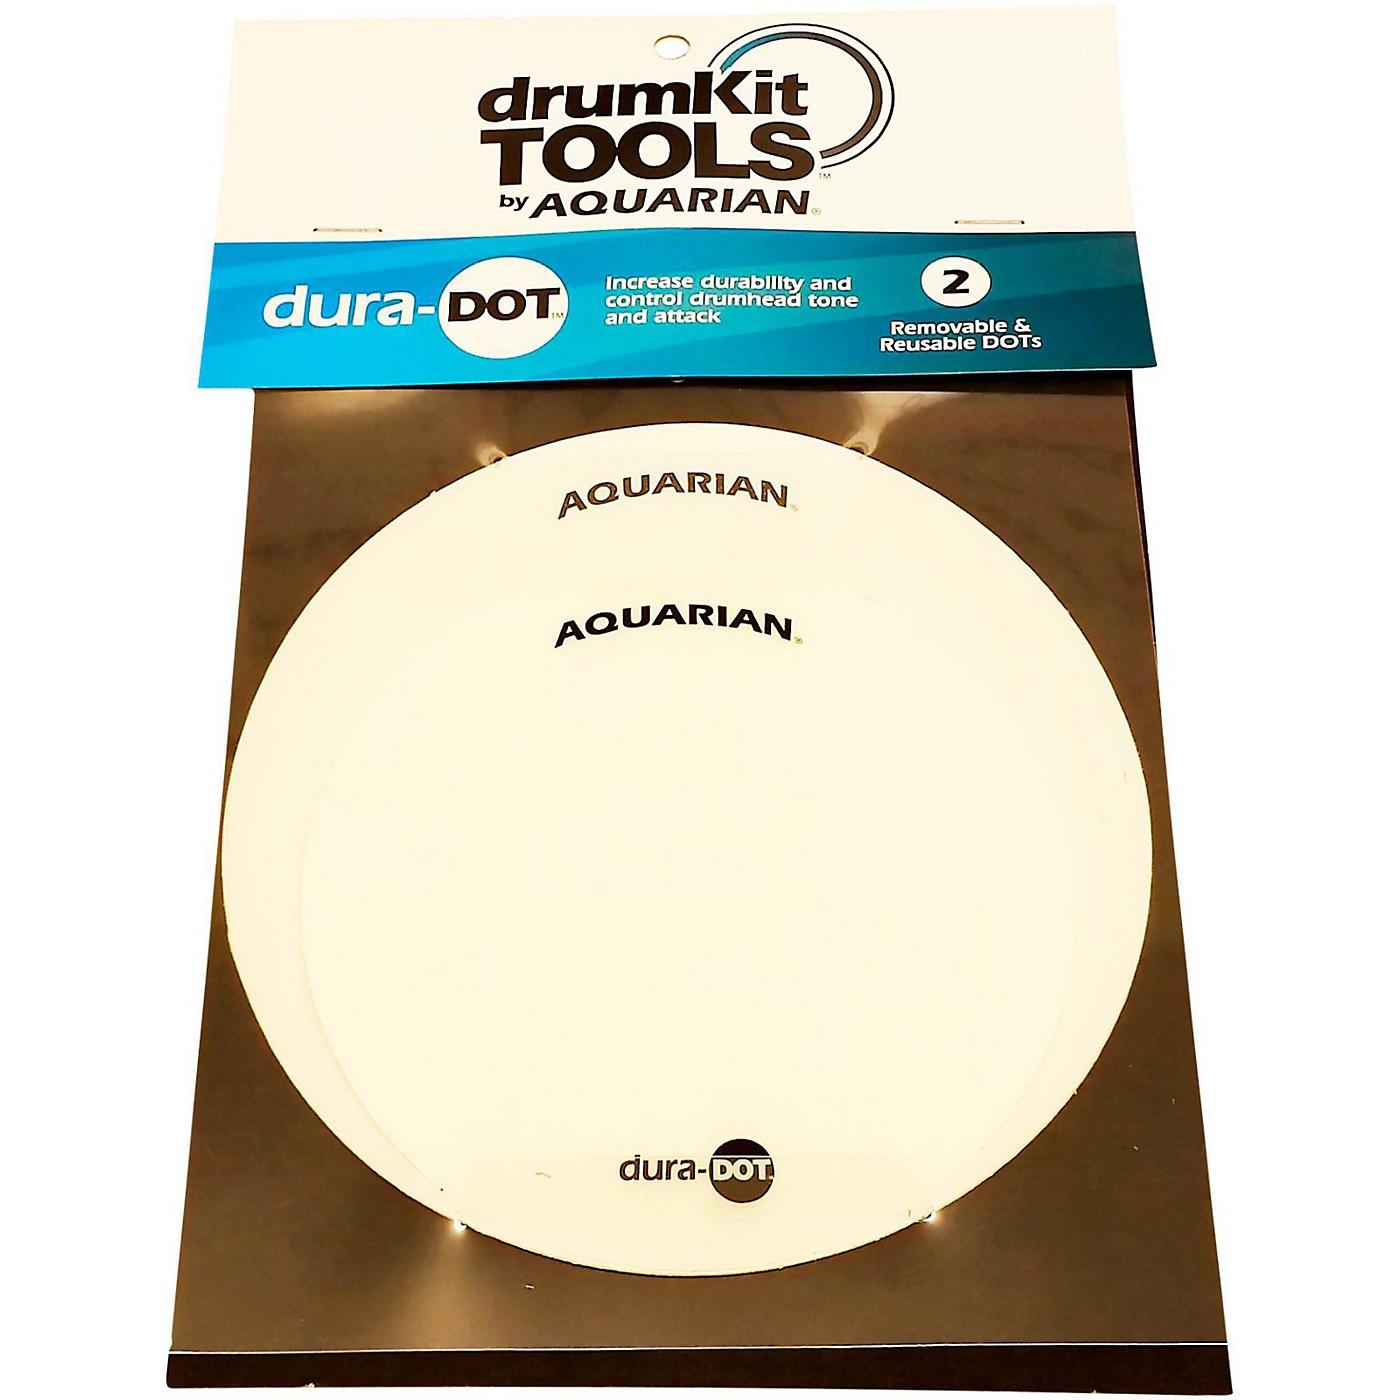 Aquarian drumKit Tools duraDOT Drum Head Tone Modifier thumbnail